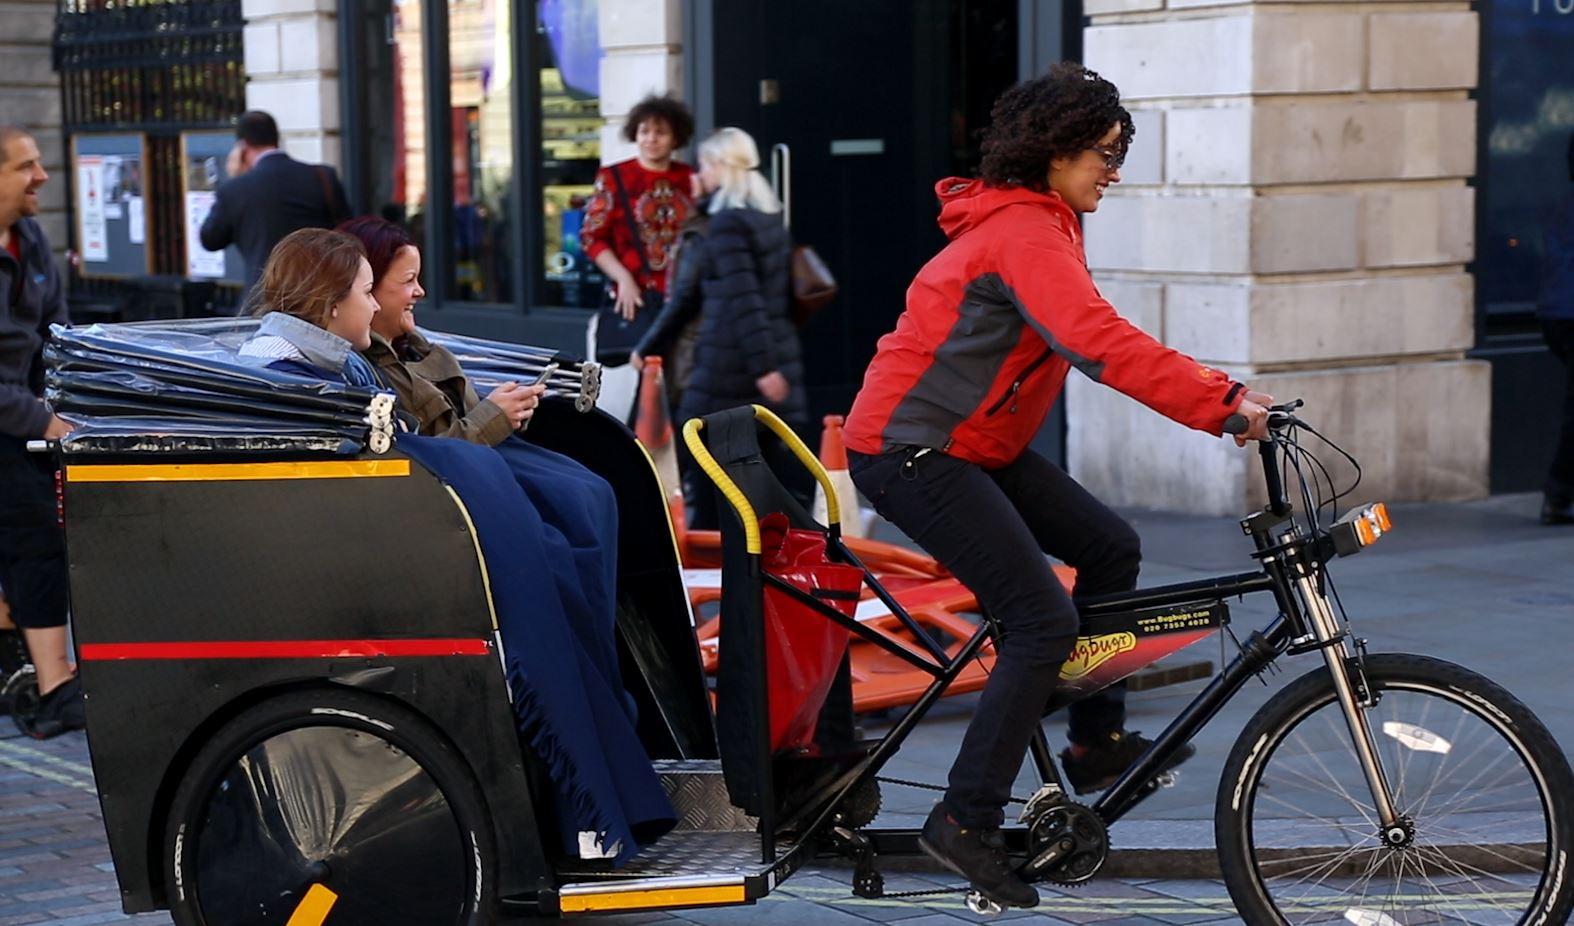 Rickshaws: A Scourge of London's Streets?